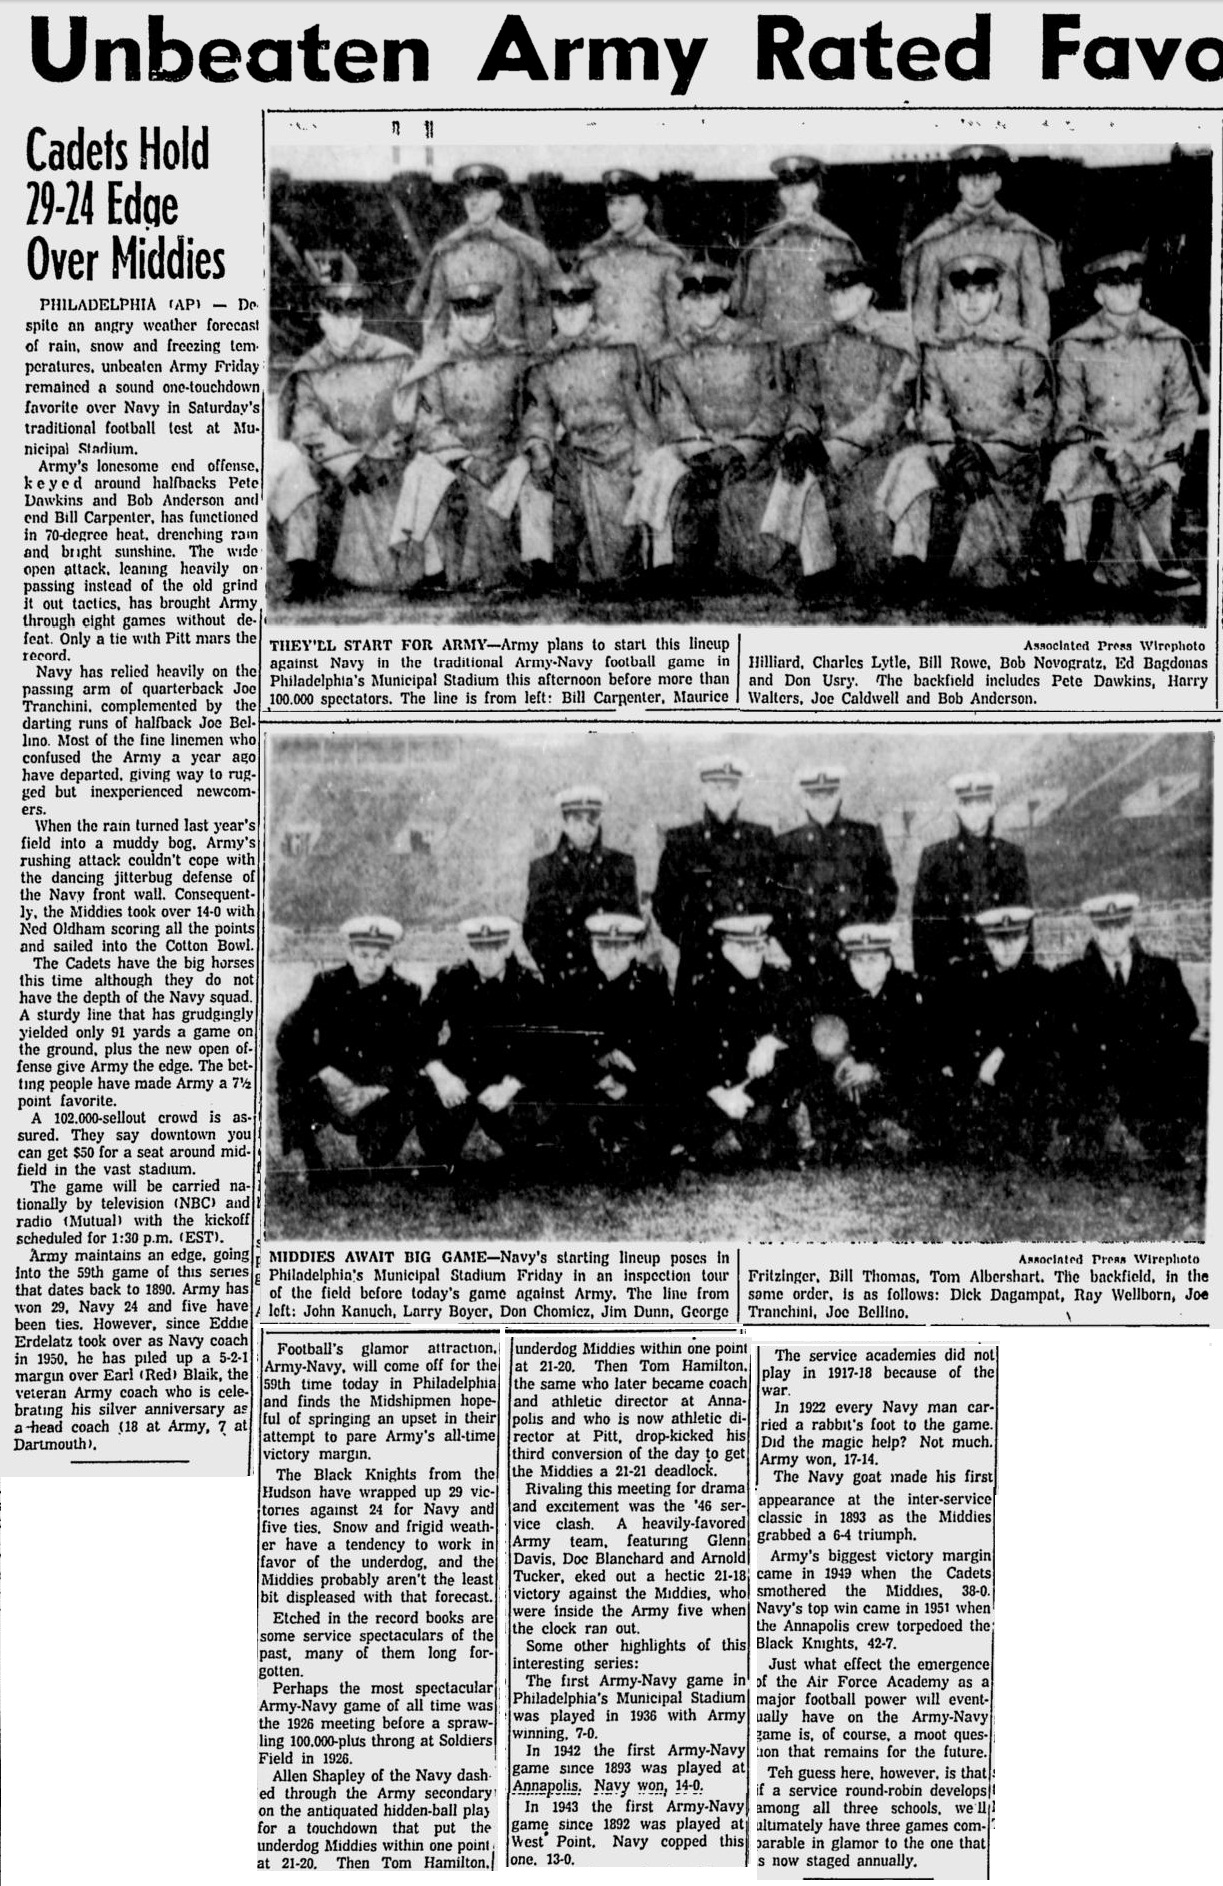 armyfb_1958_vsnavy_teams_washingtonpaobserver_nov291958